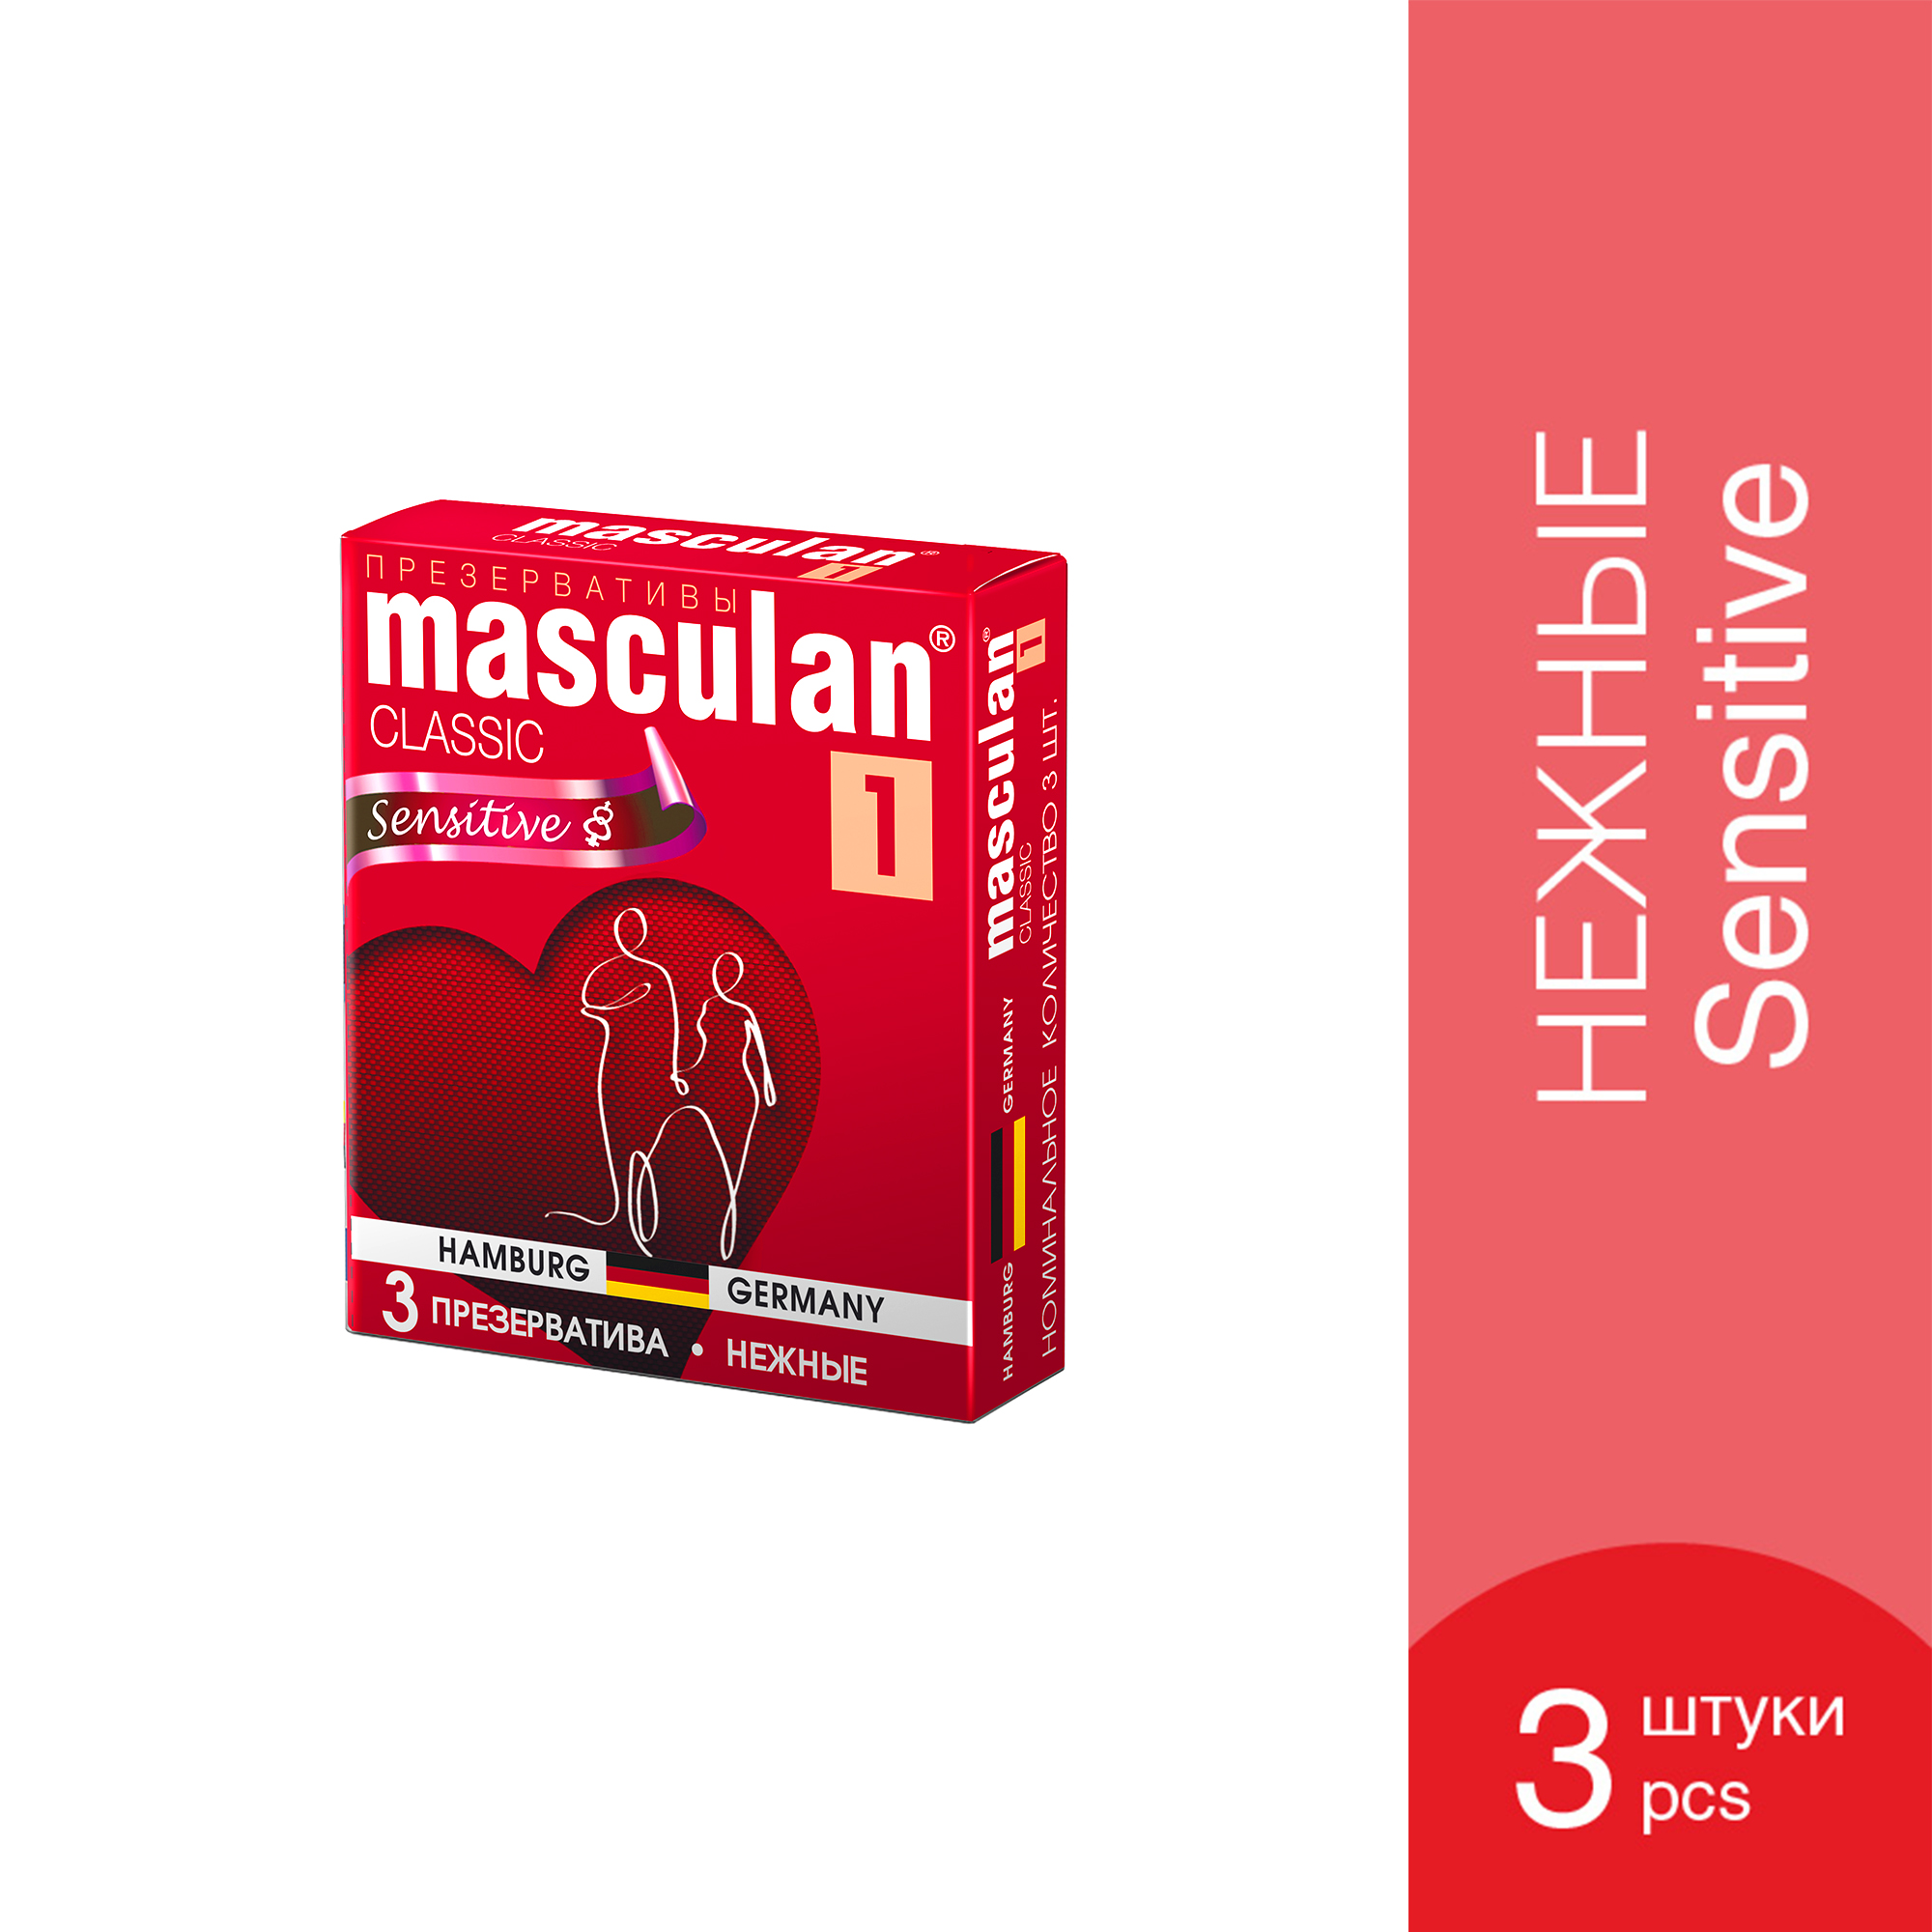 презервативы-маскулан-классик-тип1-нежные-3шт